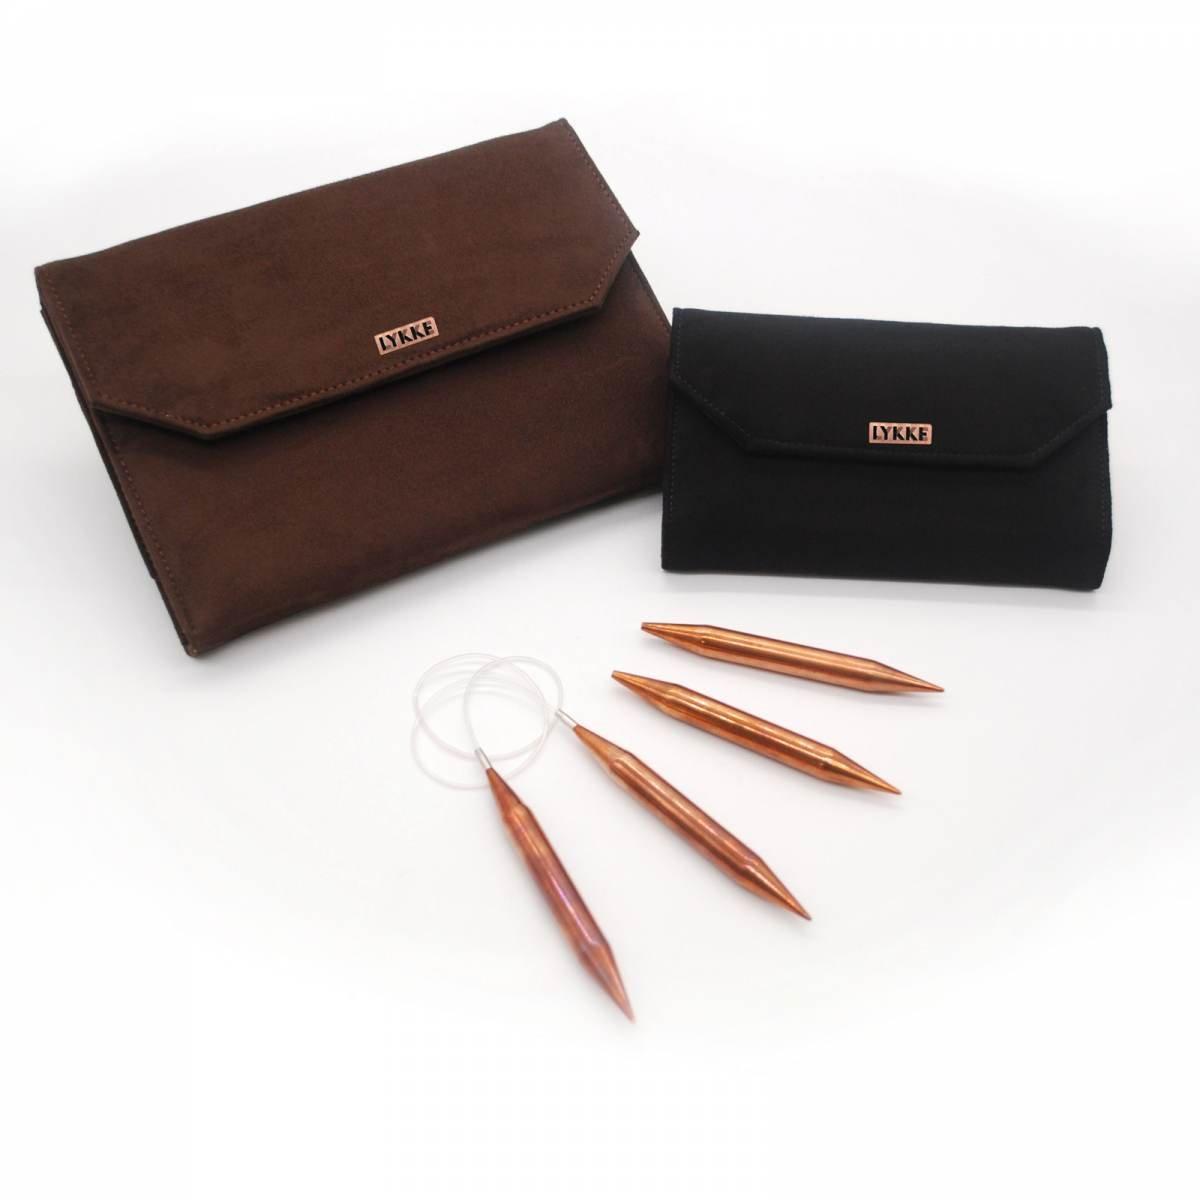 Lykke Cypra 3.5 Interchangable Copper Knitting Needle Set